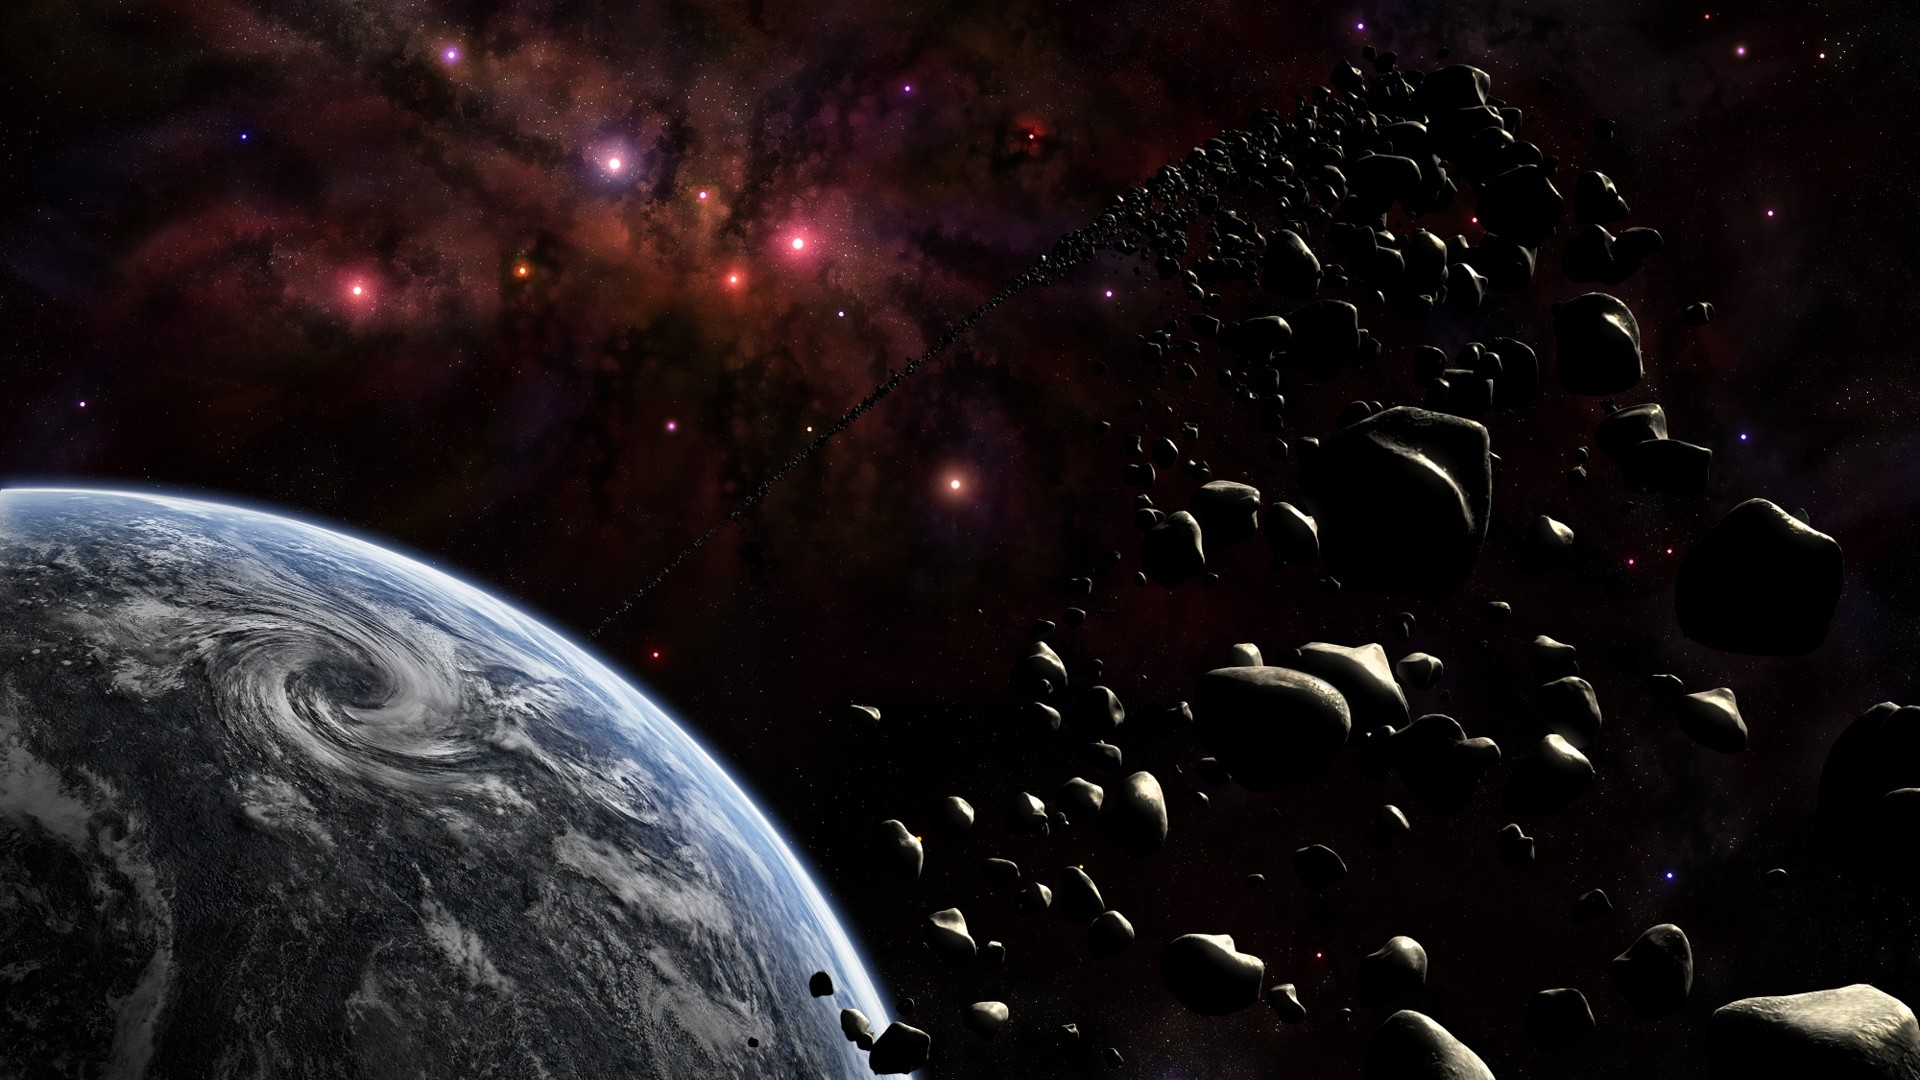 Download 'omega 9 deep space' HD wallpaper